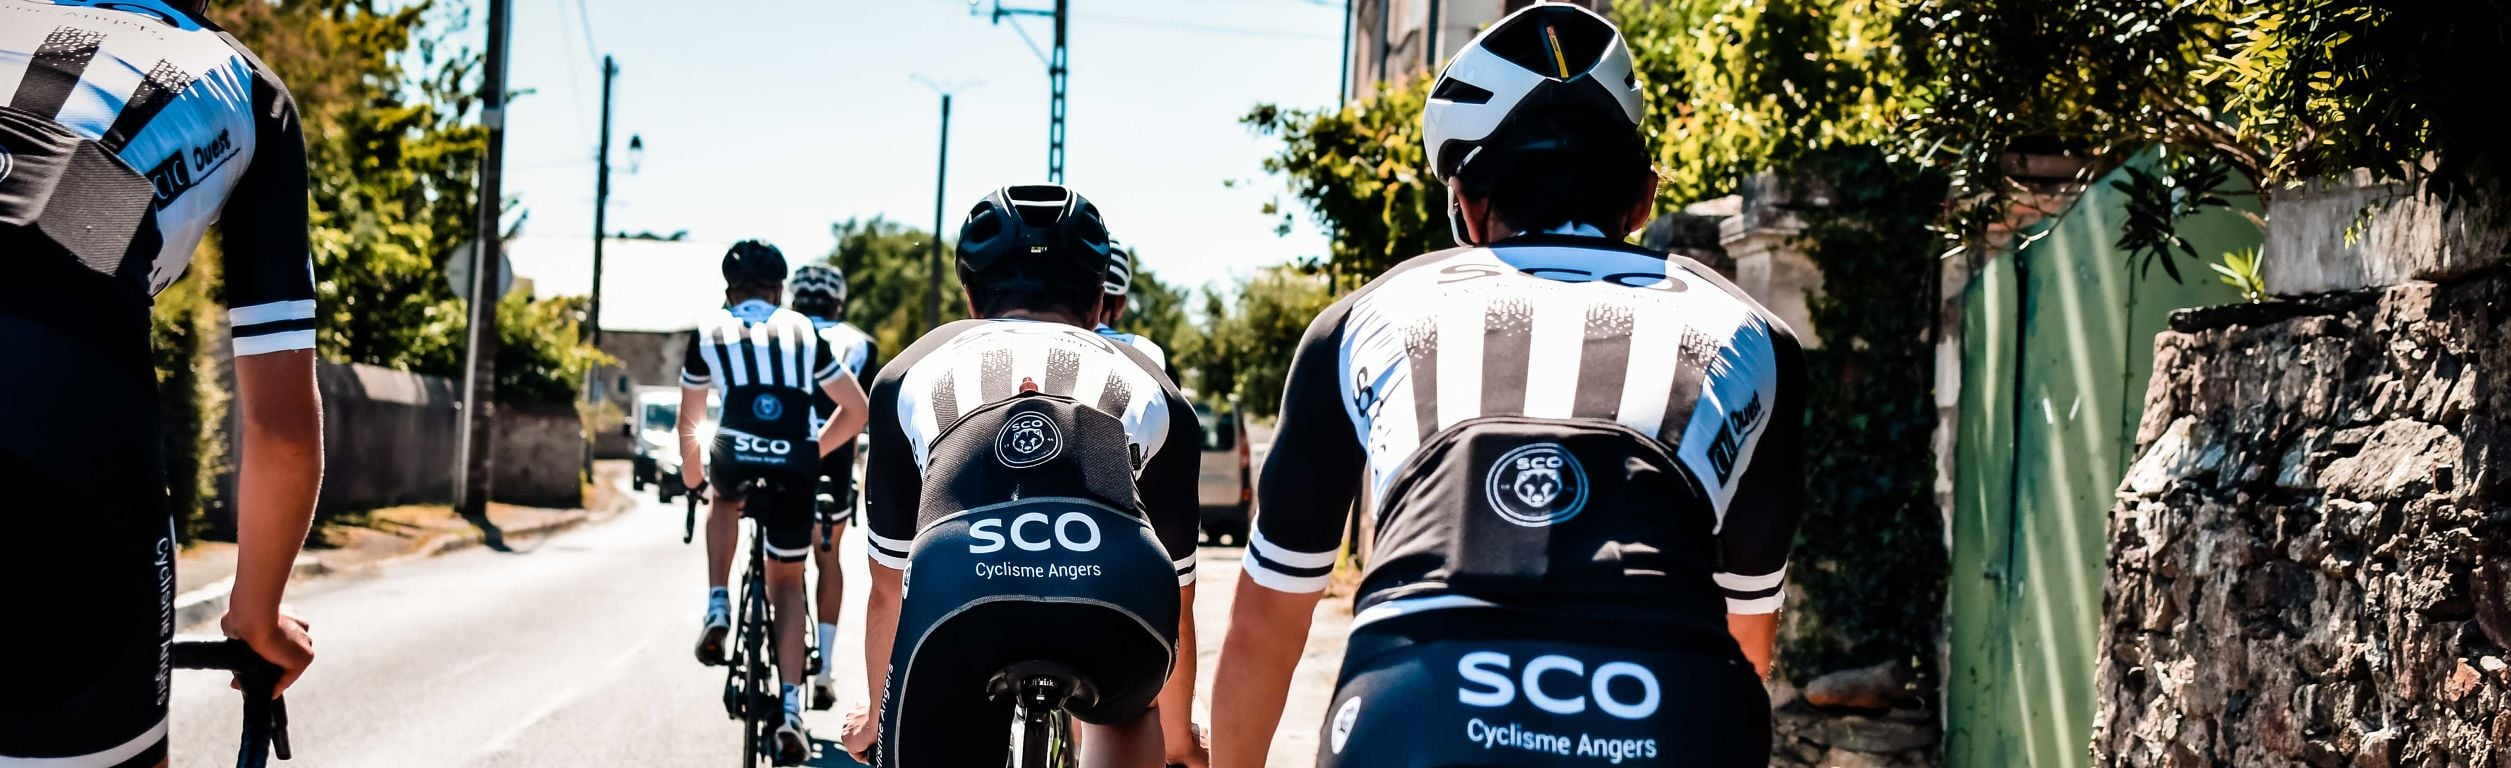 SCO Cyclisme Angers